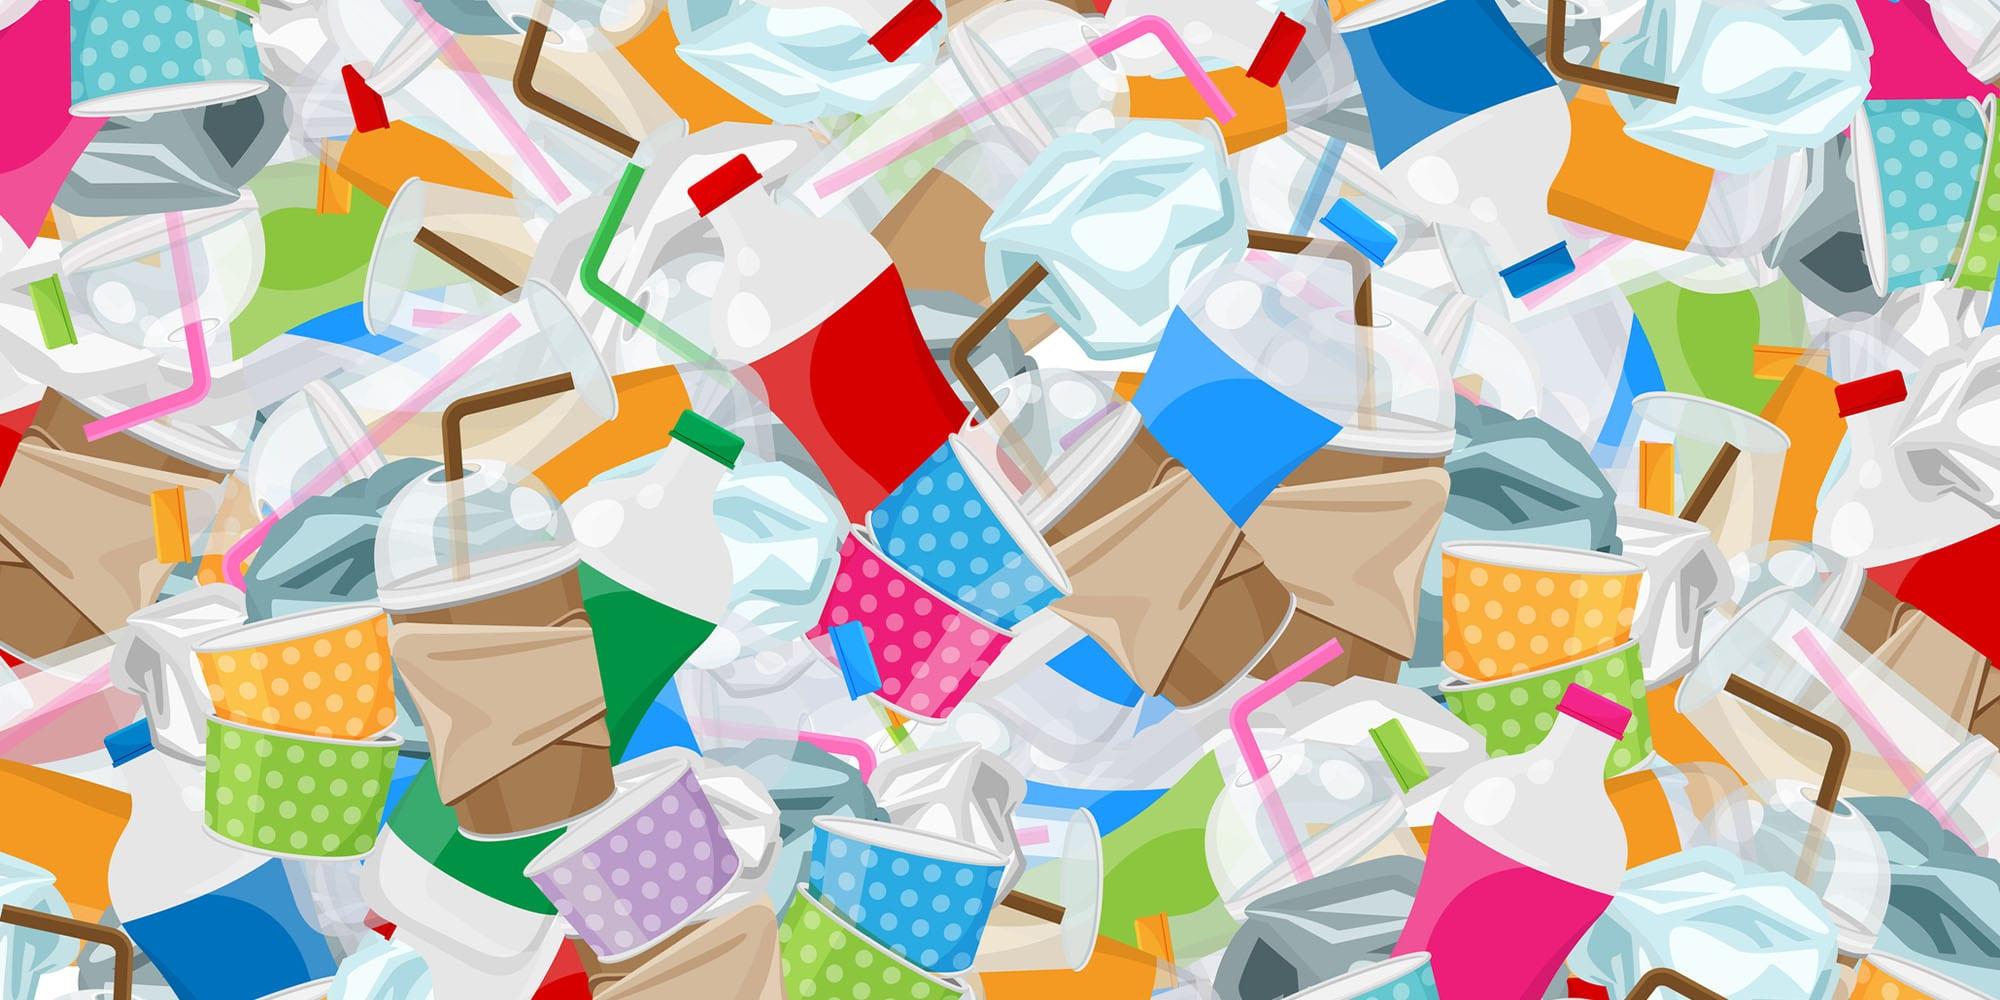 Rethinking the future of plastic